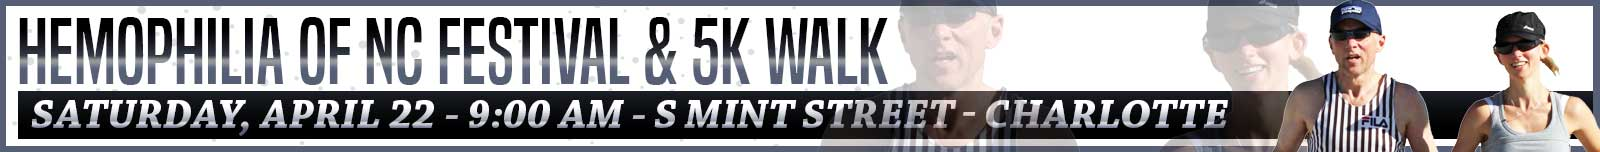 Hemophilia of NC Festival & 5K Walk